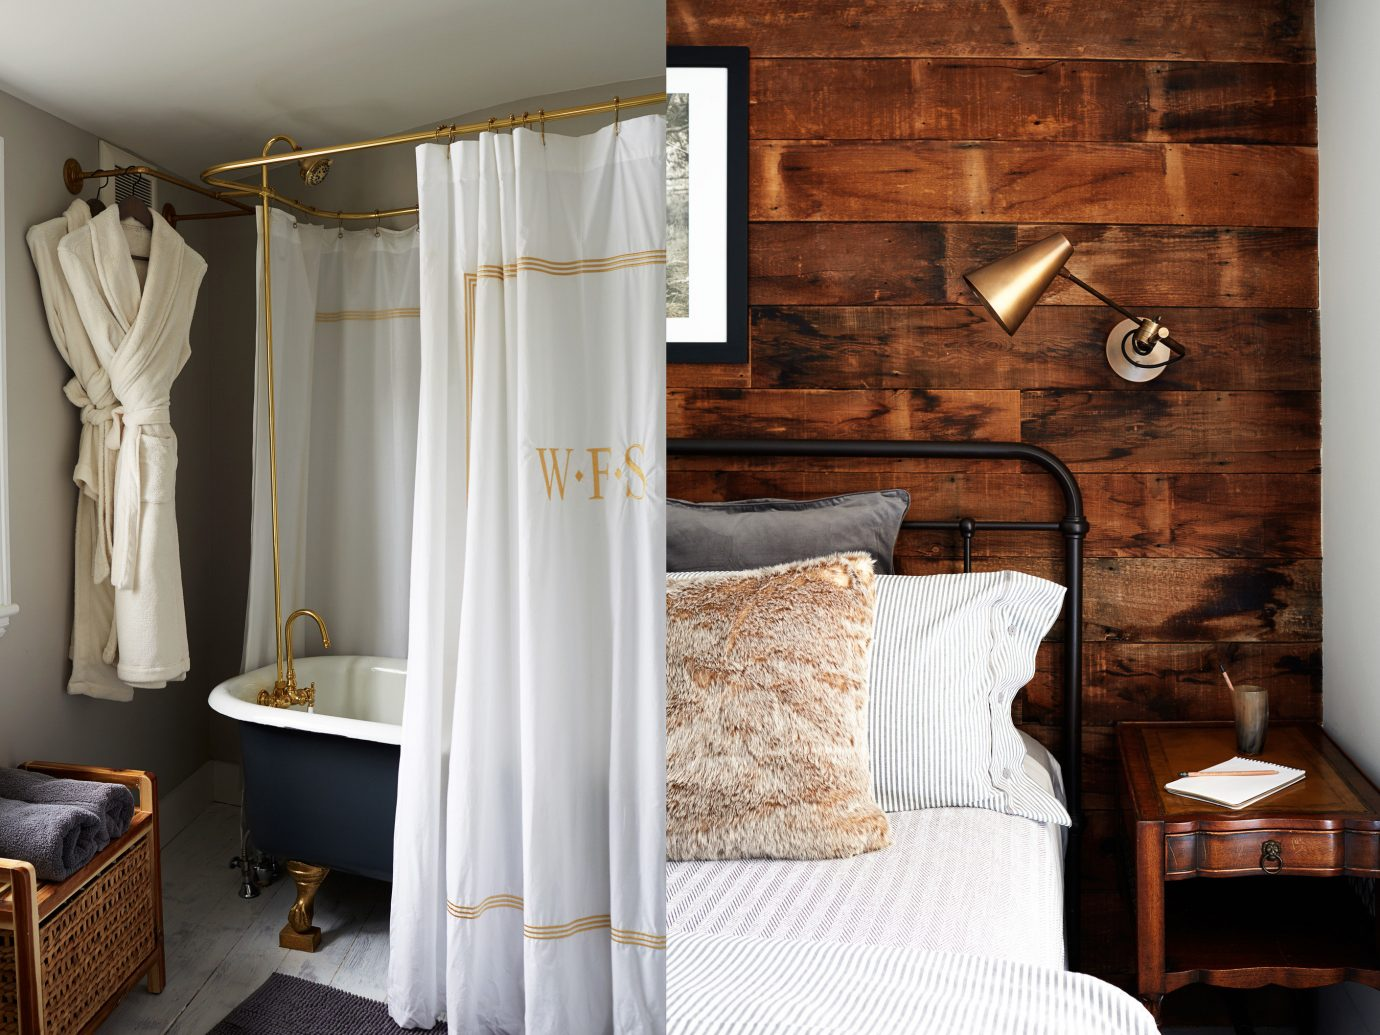 Hotels indoor wall room bed Bedroom interior design curtain furniture floor textile Suite cottage wardrobe